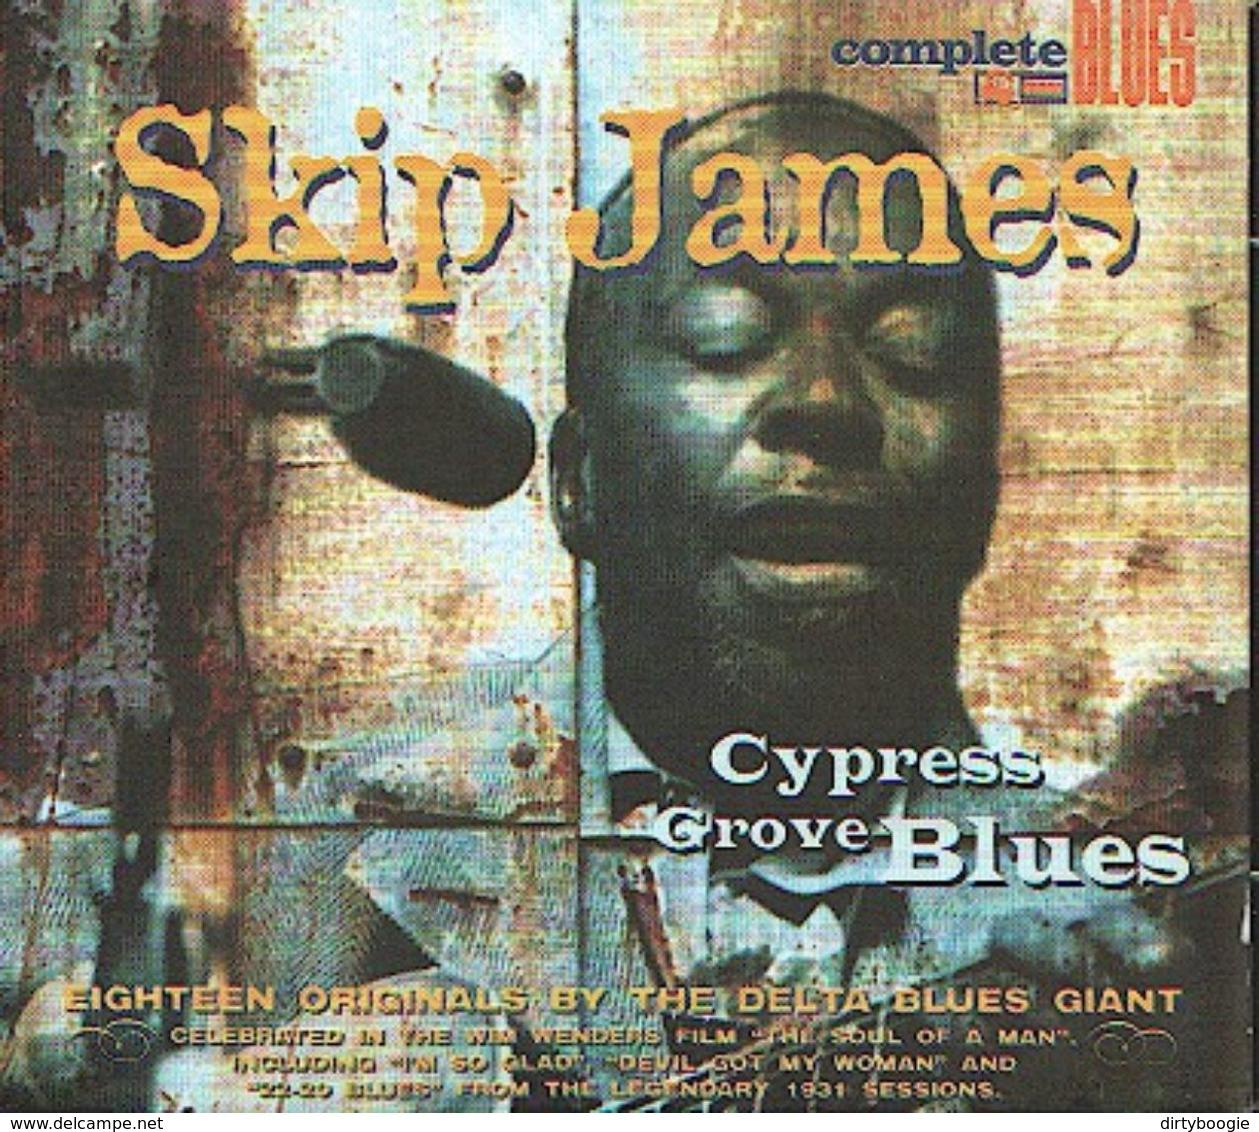 Skip JAMES - Cypress Grove Blues - CD - Blues